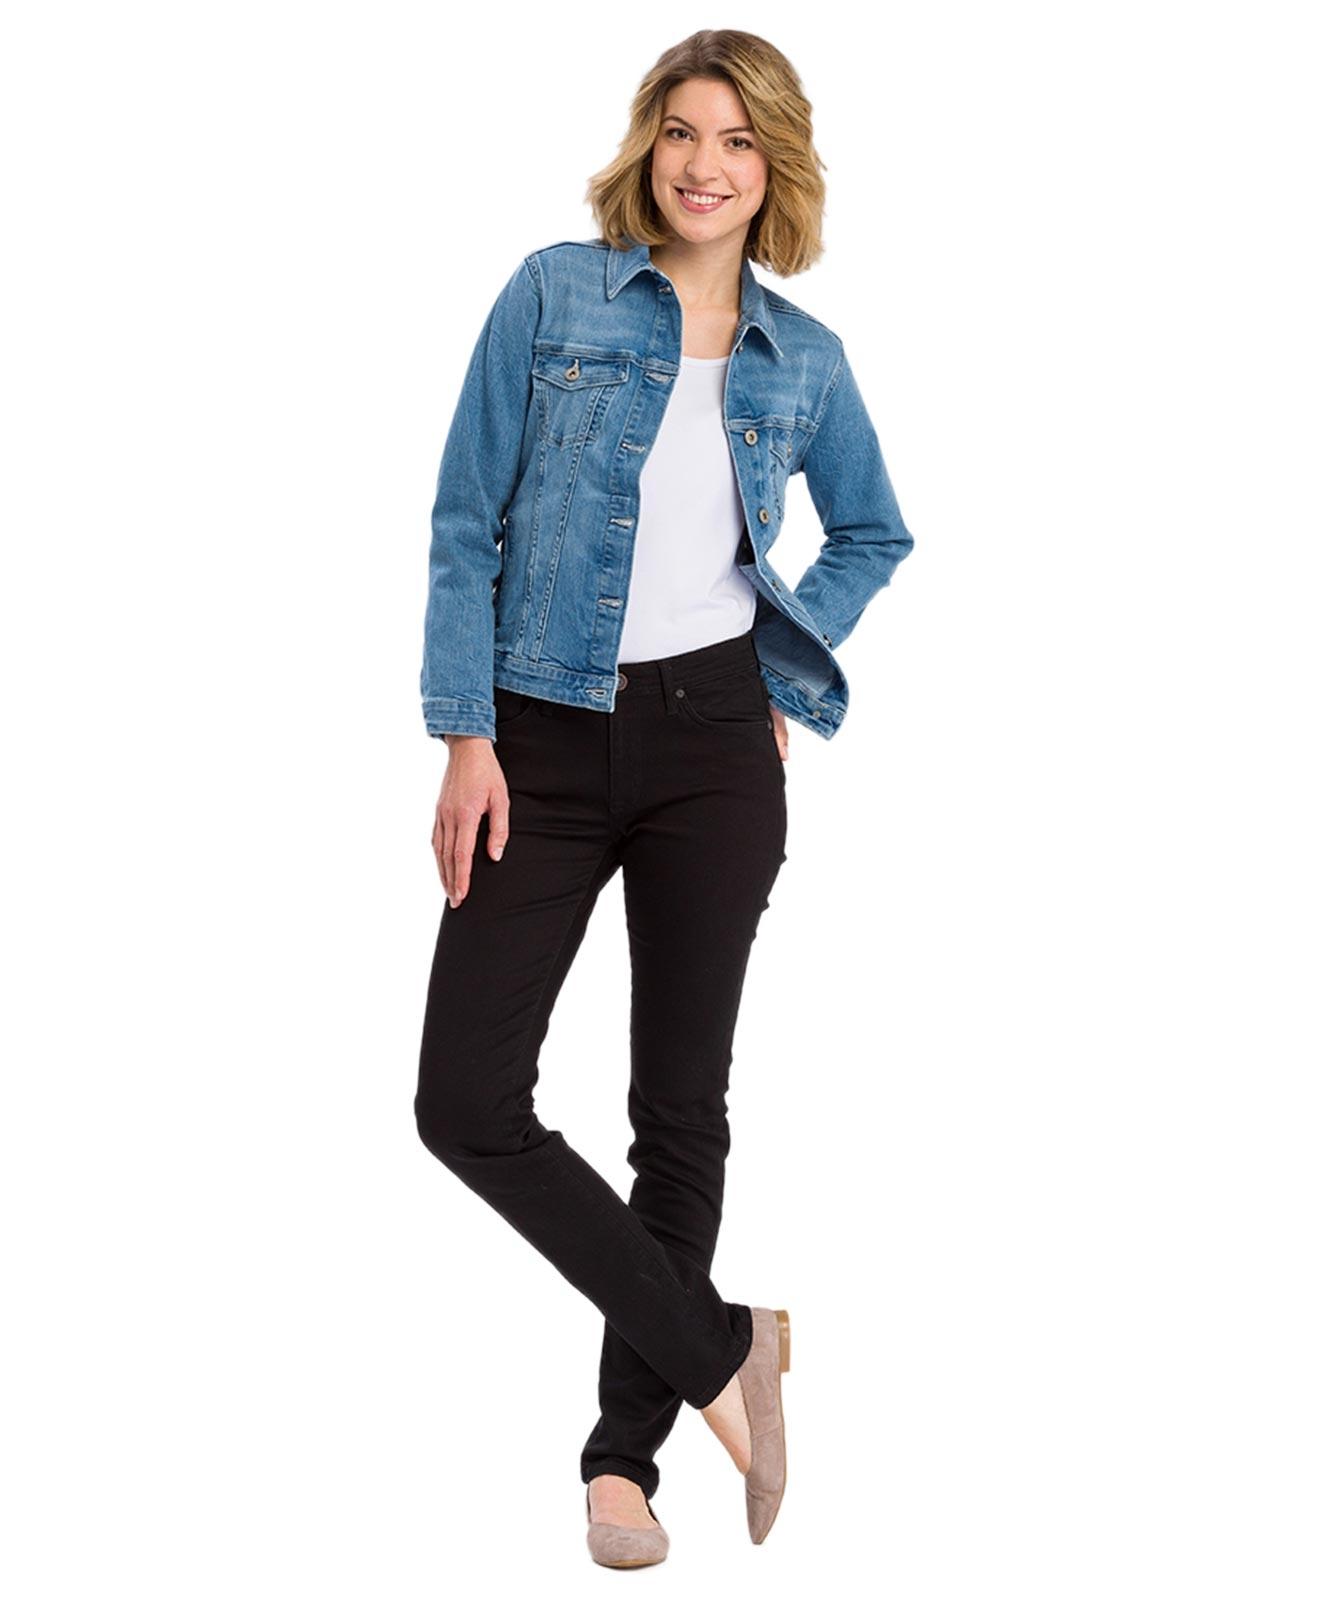 Hosen - Cross Mom Jeans Anya in Black  - Onlineshop Jeans Meile